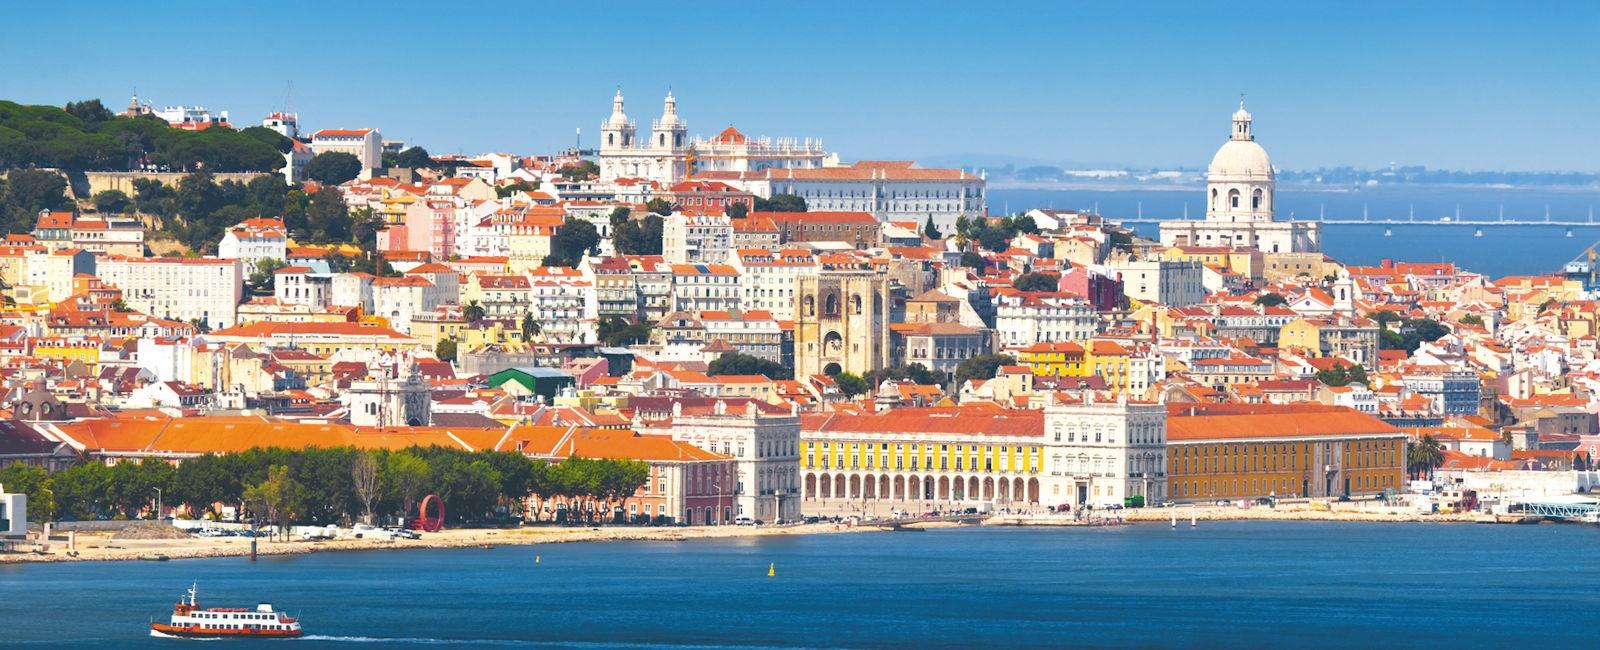 Lisbon main image